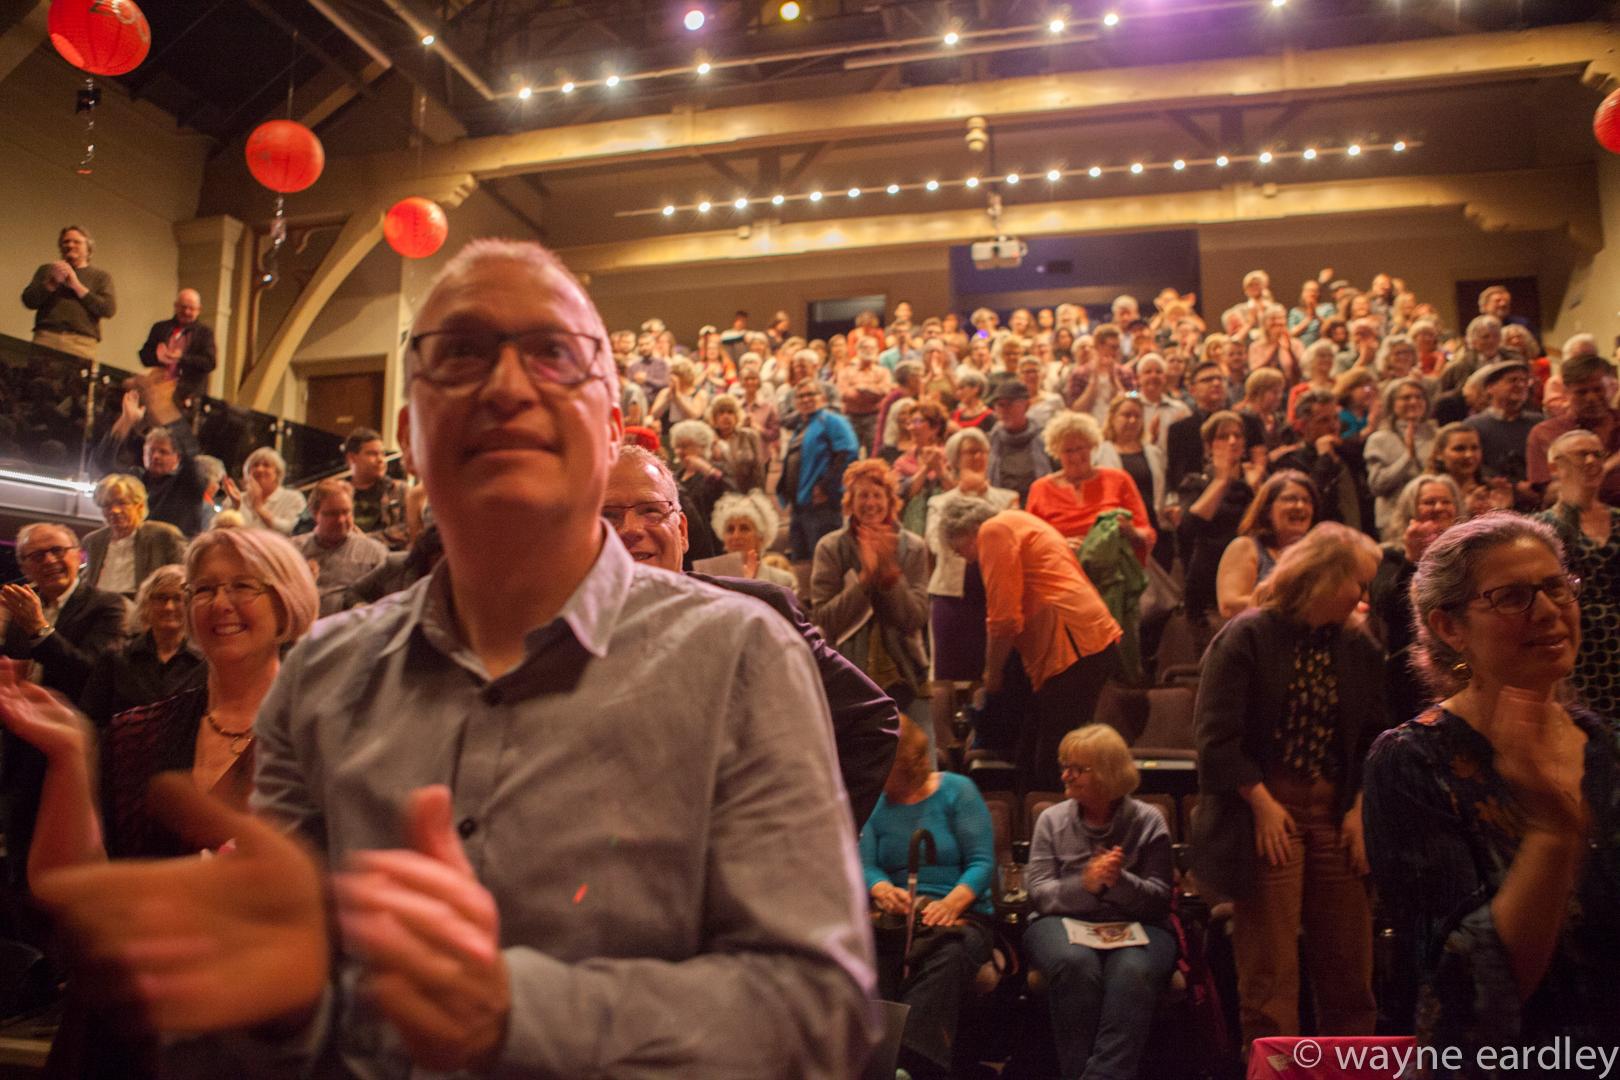 An audience applauds. Photo credit to Wayne Eardley